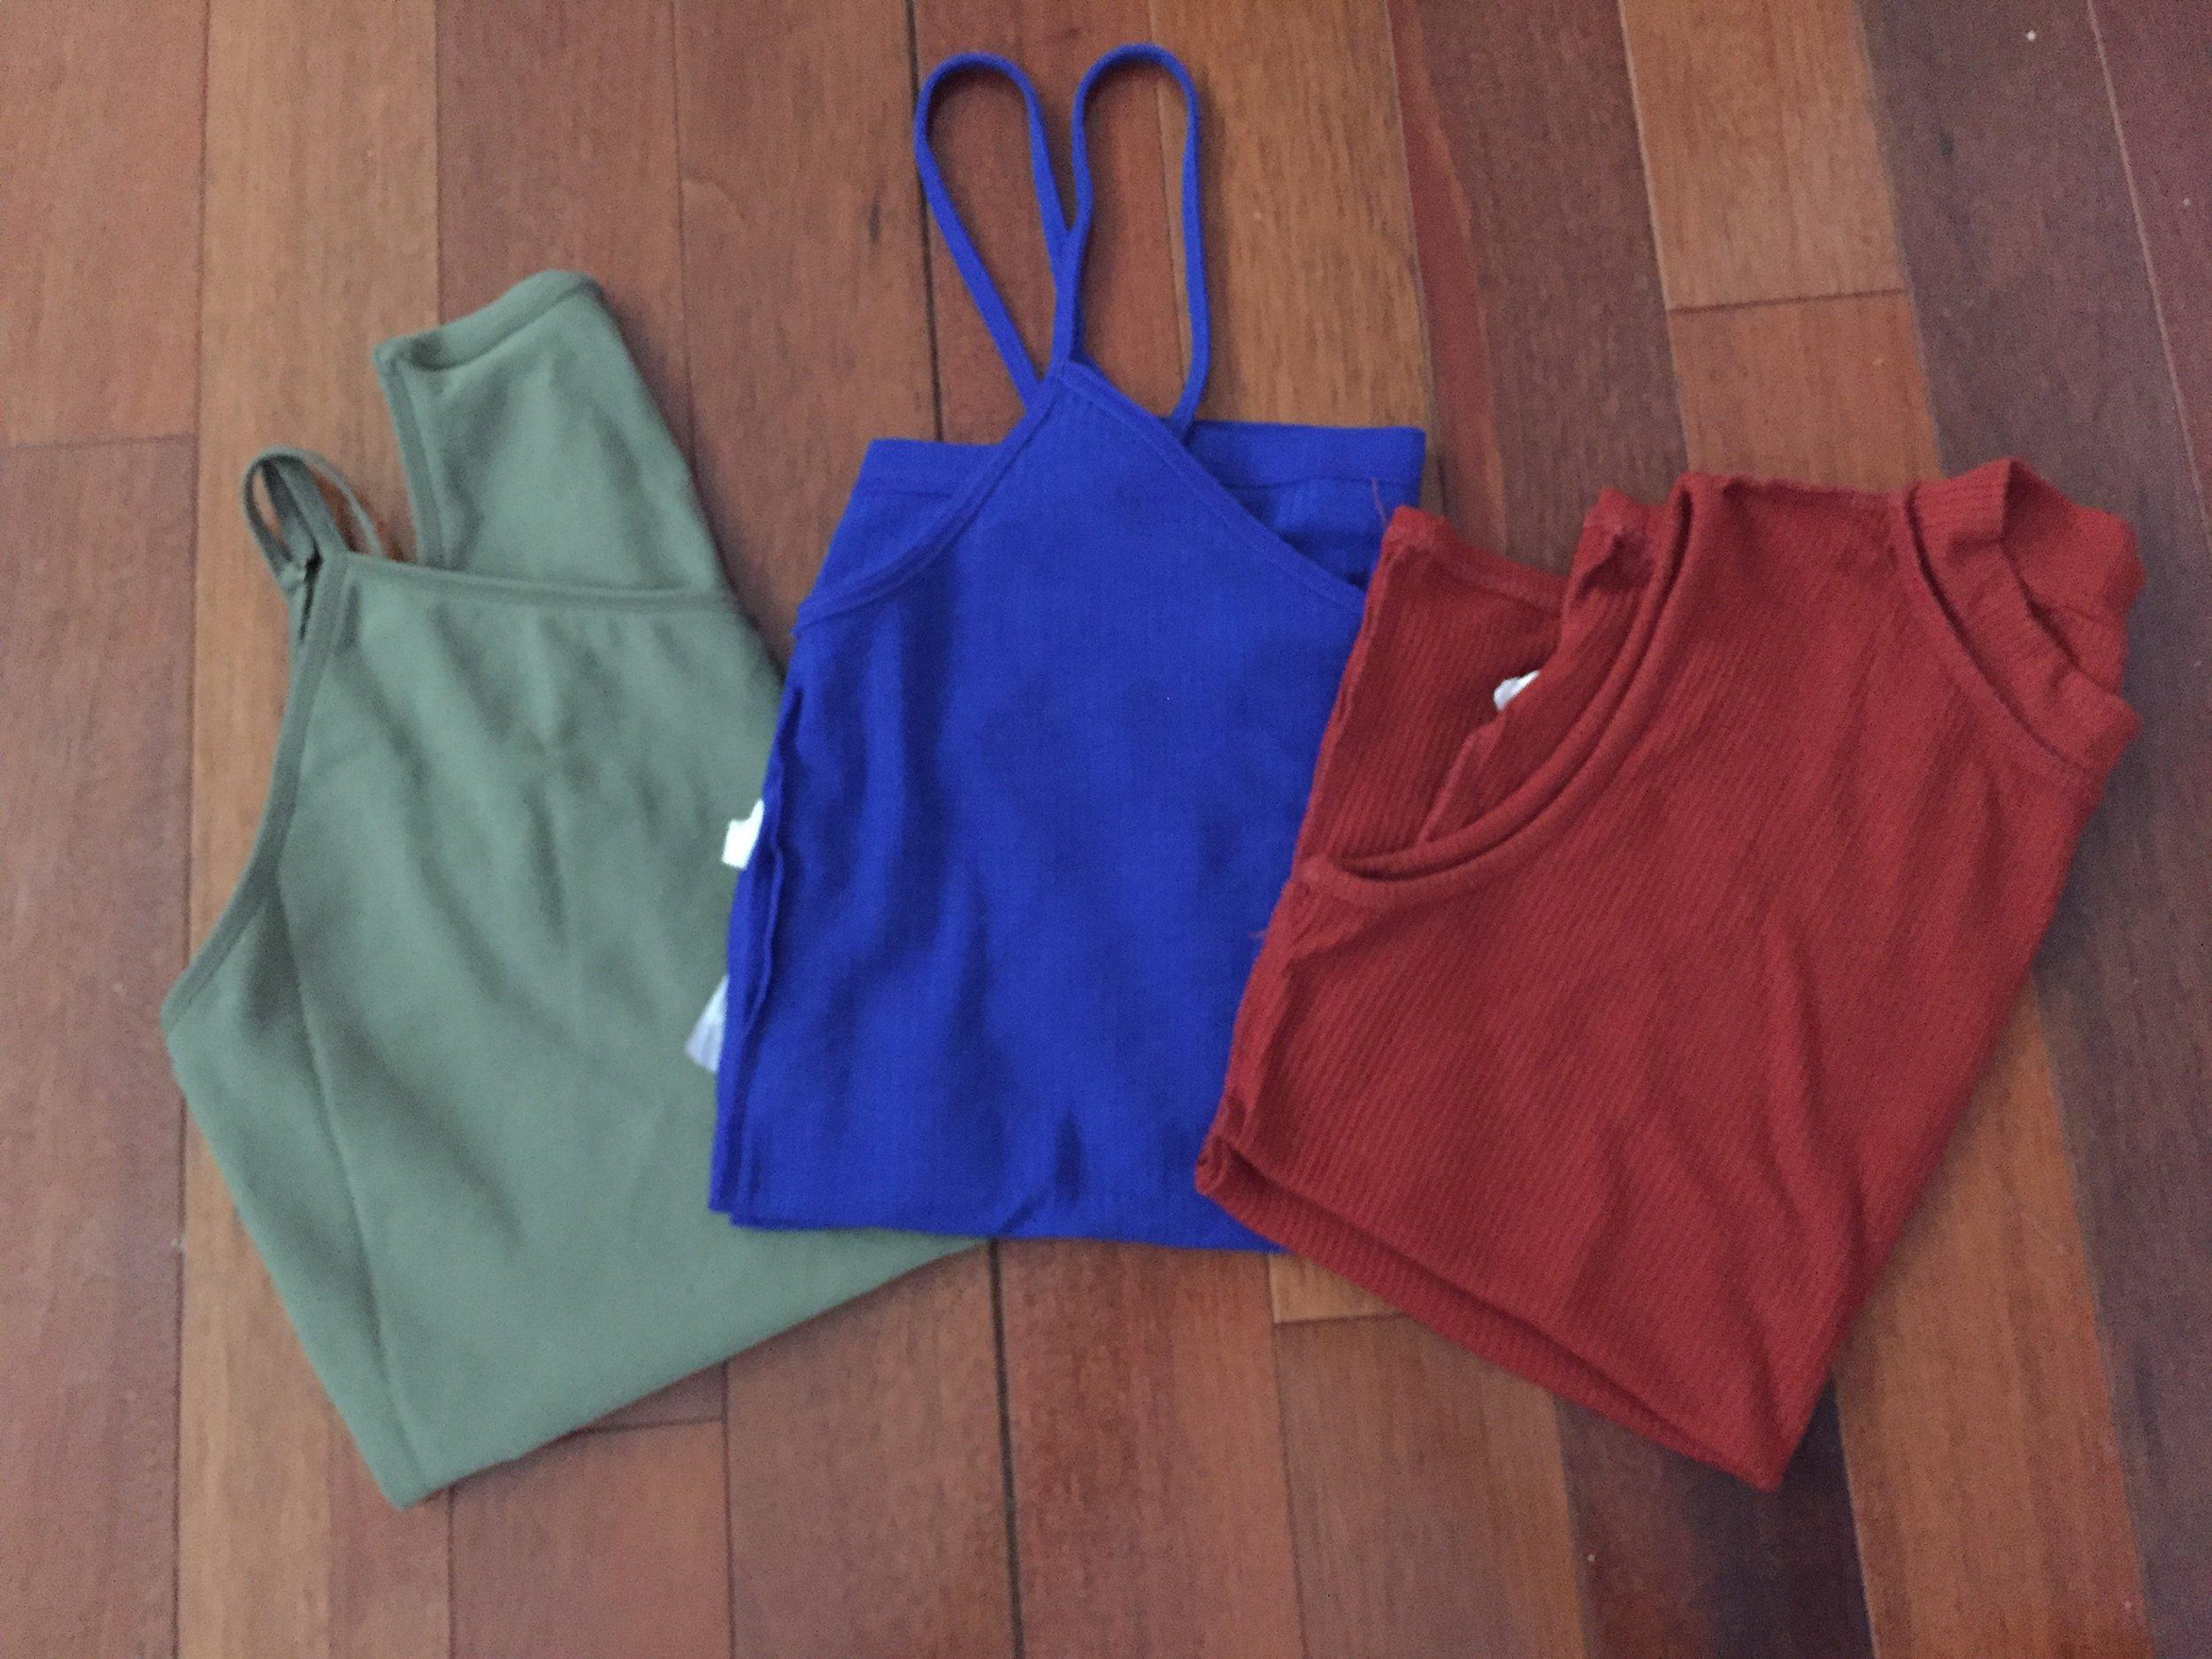 3 sleeveless shirts